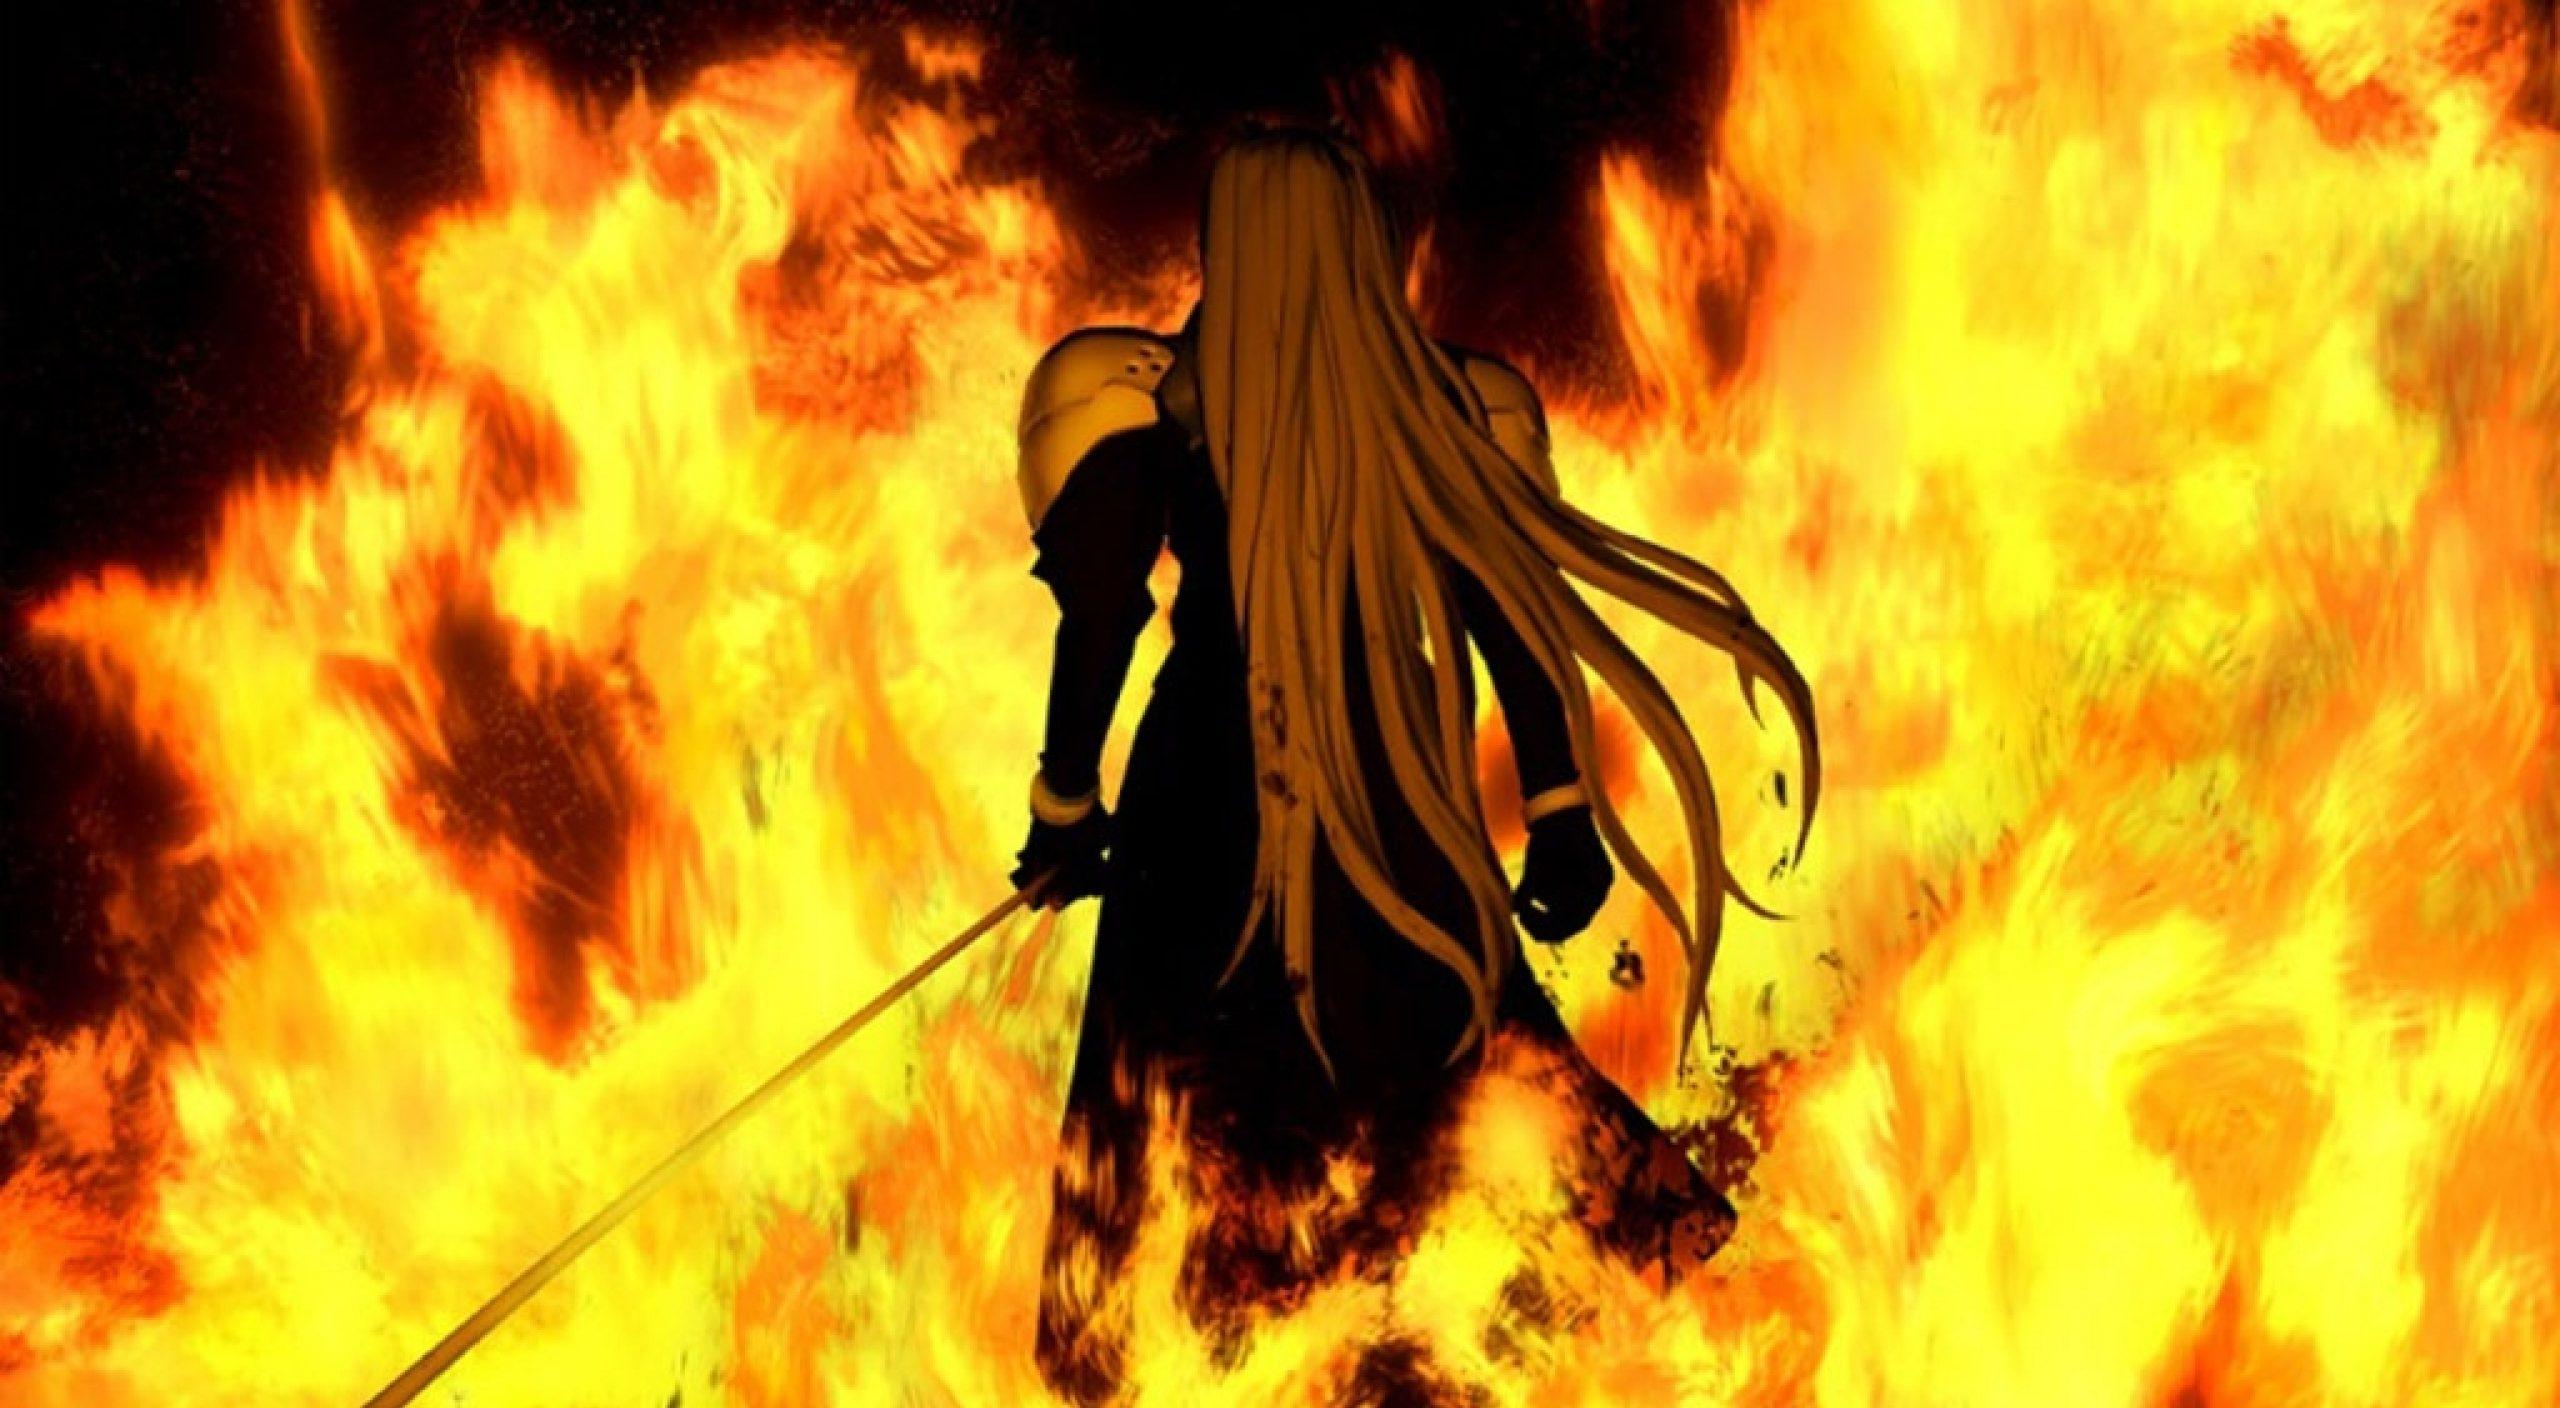 [عکس: final_fantasy_fire_sephiroth_1024x768_wa...175753.jpg]